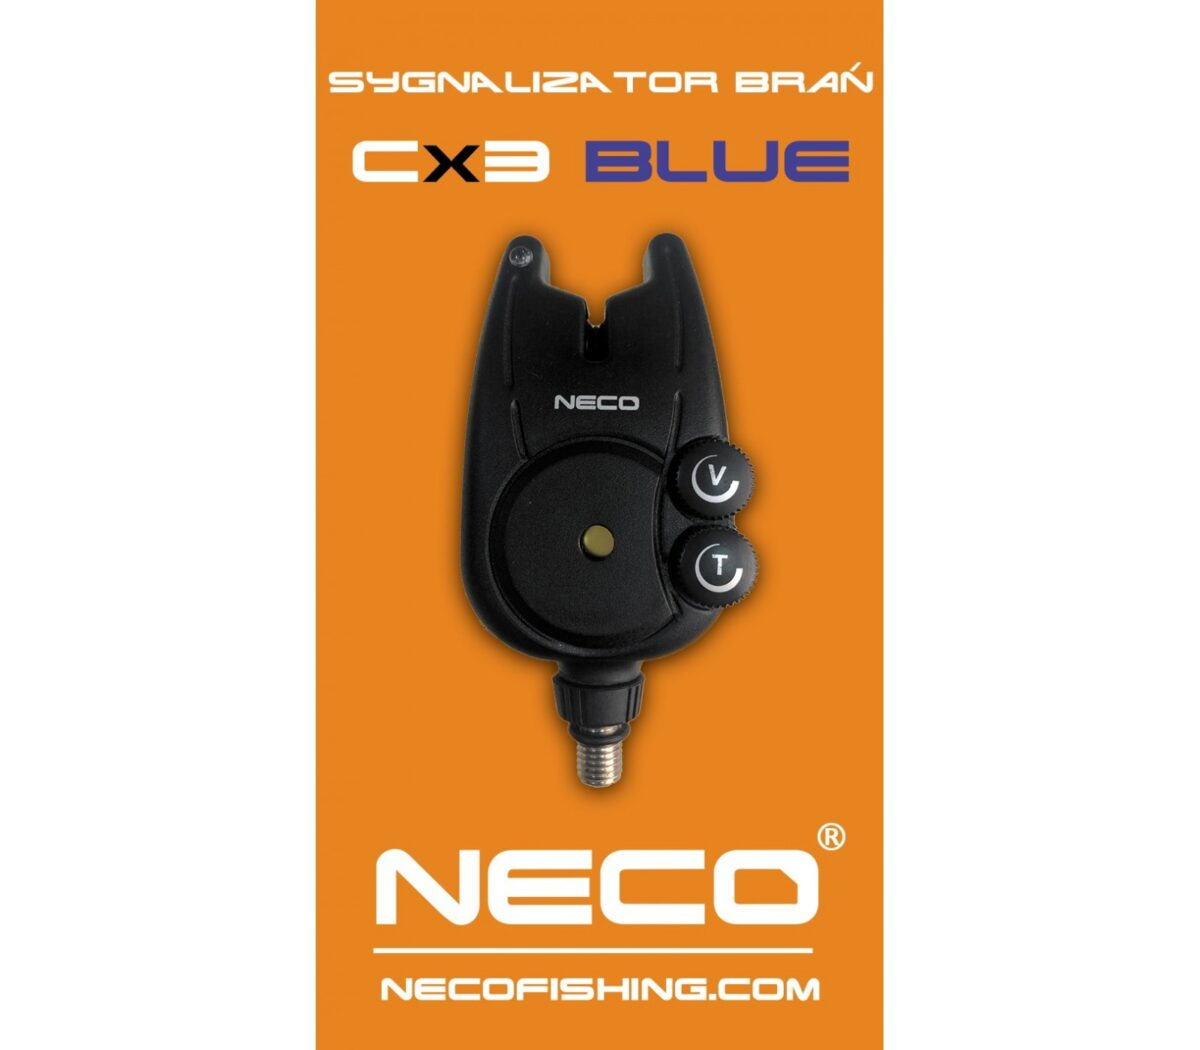 Сигнализатор шарански Neco CX3 BLUE